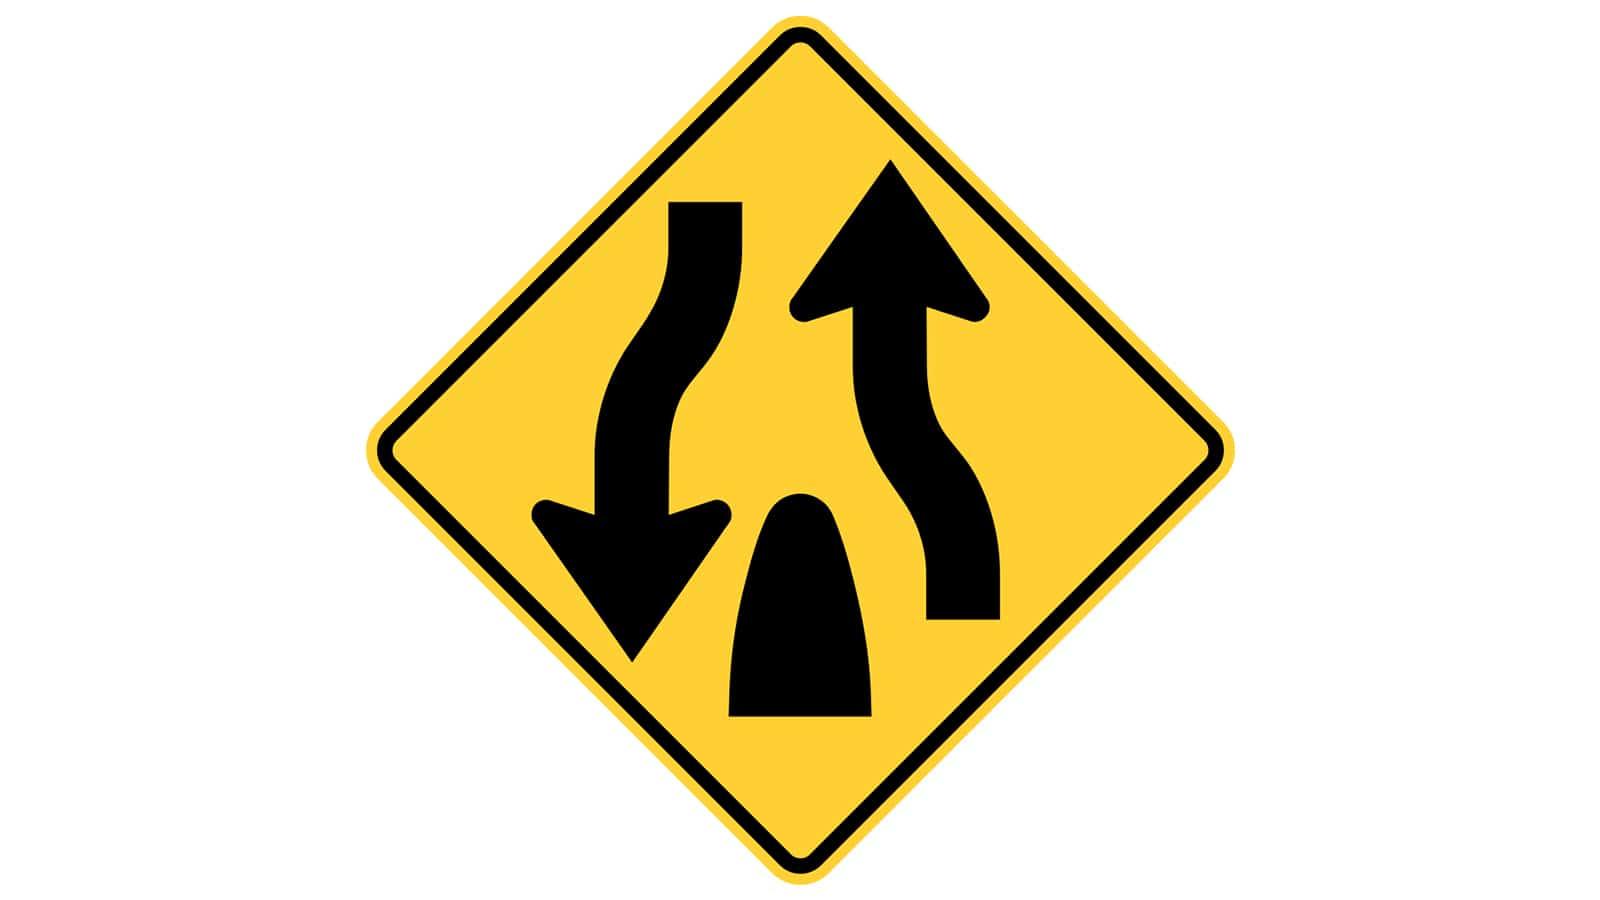 Warning sign Divided Highway Ends